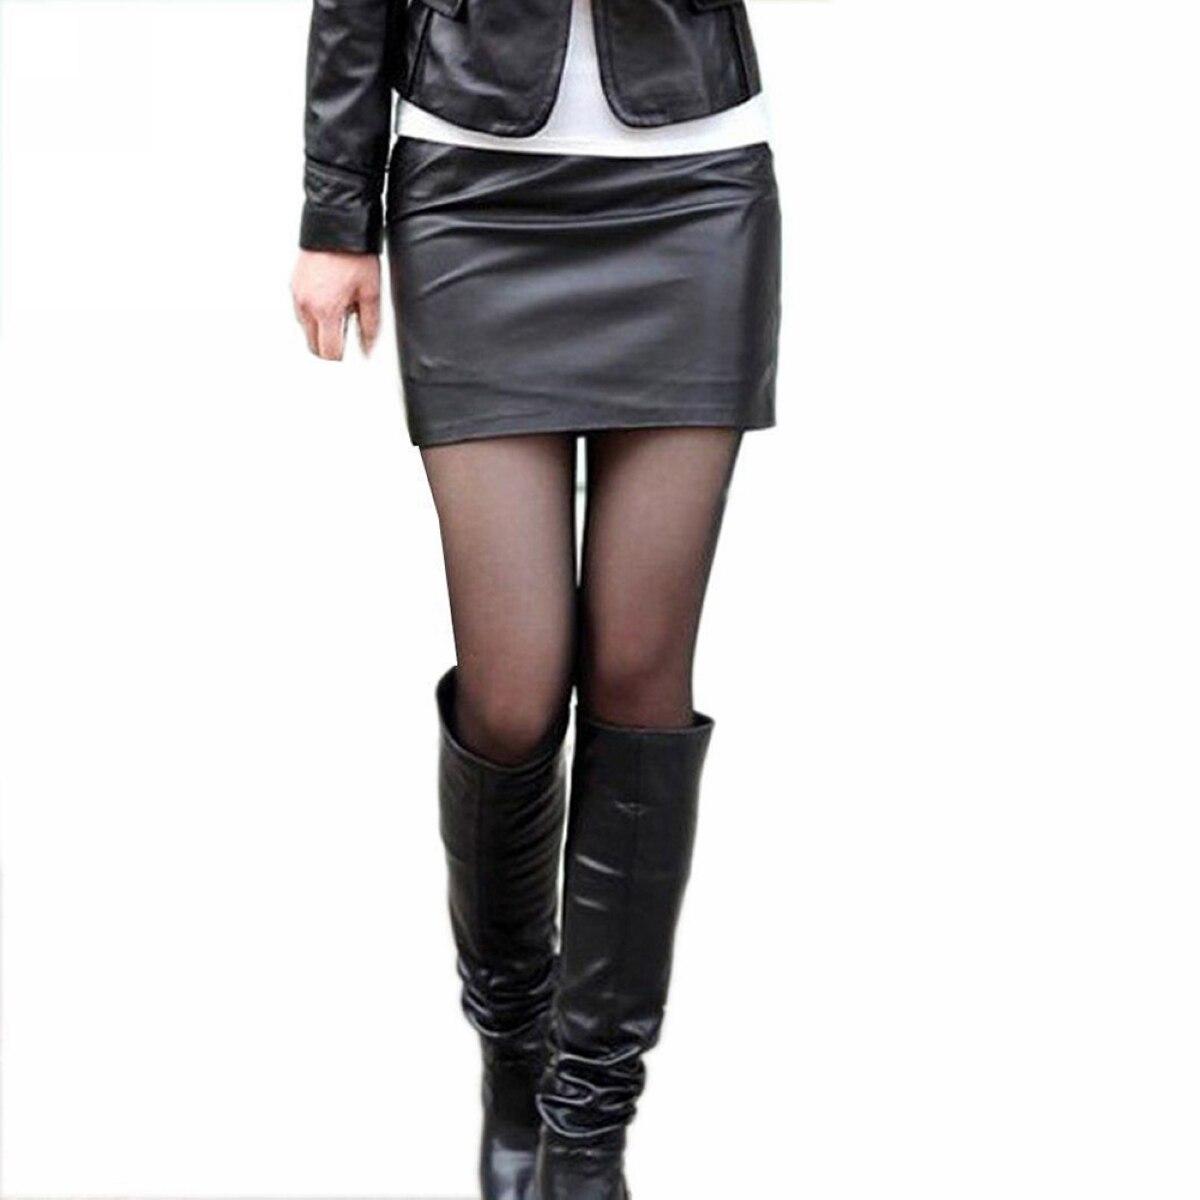 Sexy Women Pencil Slim Stretch Bodycon High Waist OL Mini Short Skirt Party Club Soft PU Cloth Package Hip Black One Size